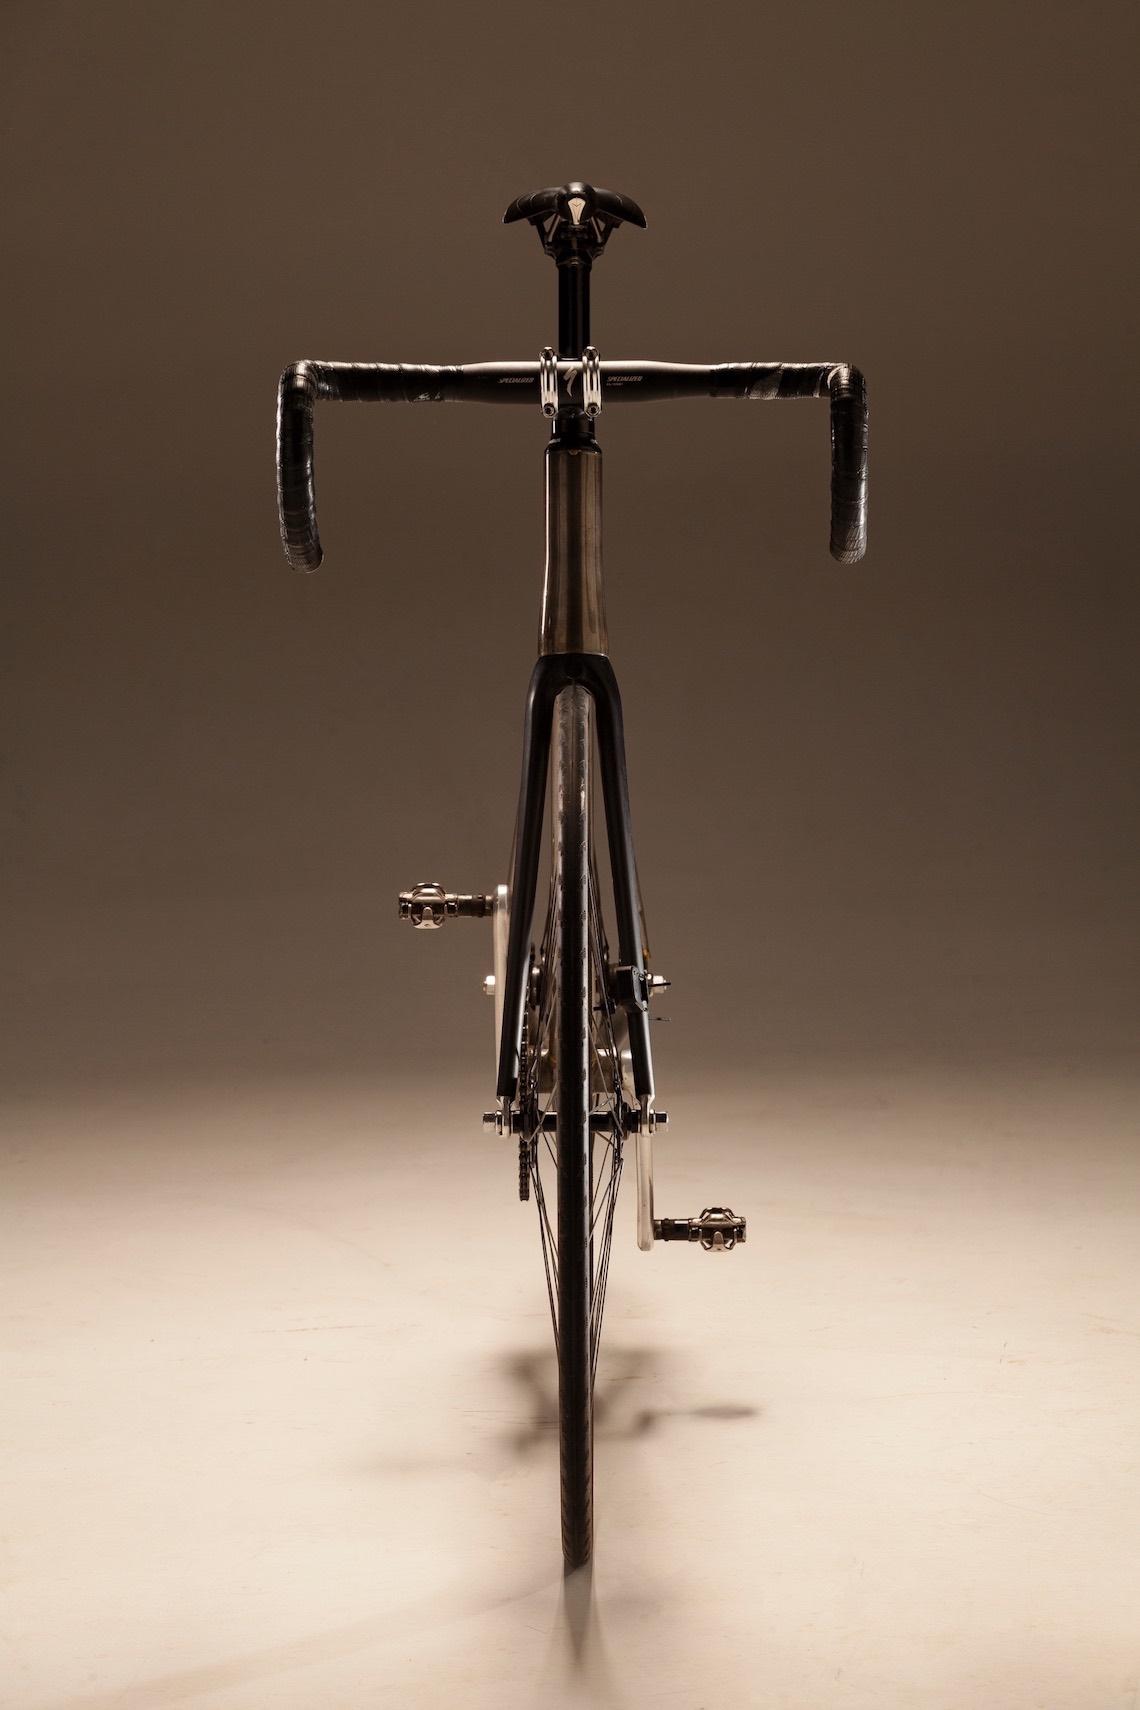 Anton Grebentsov photography_bicycle_urbancycling_5